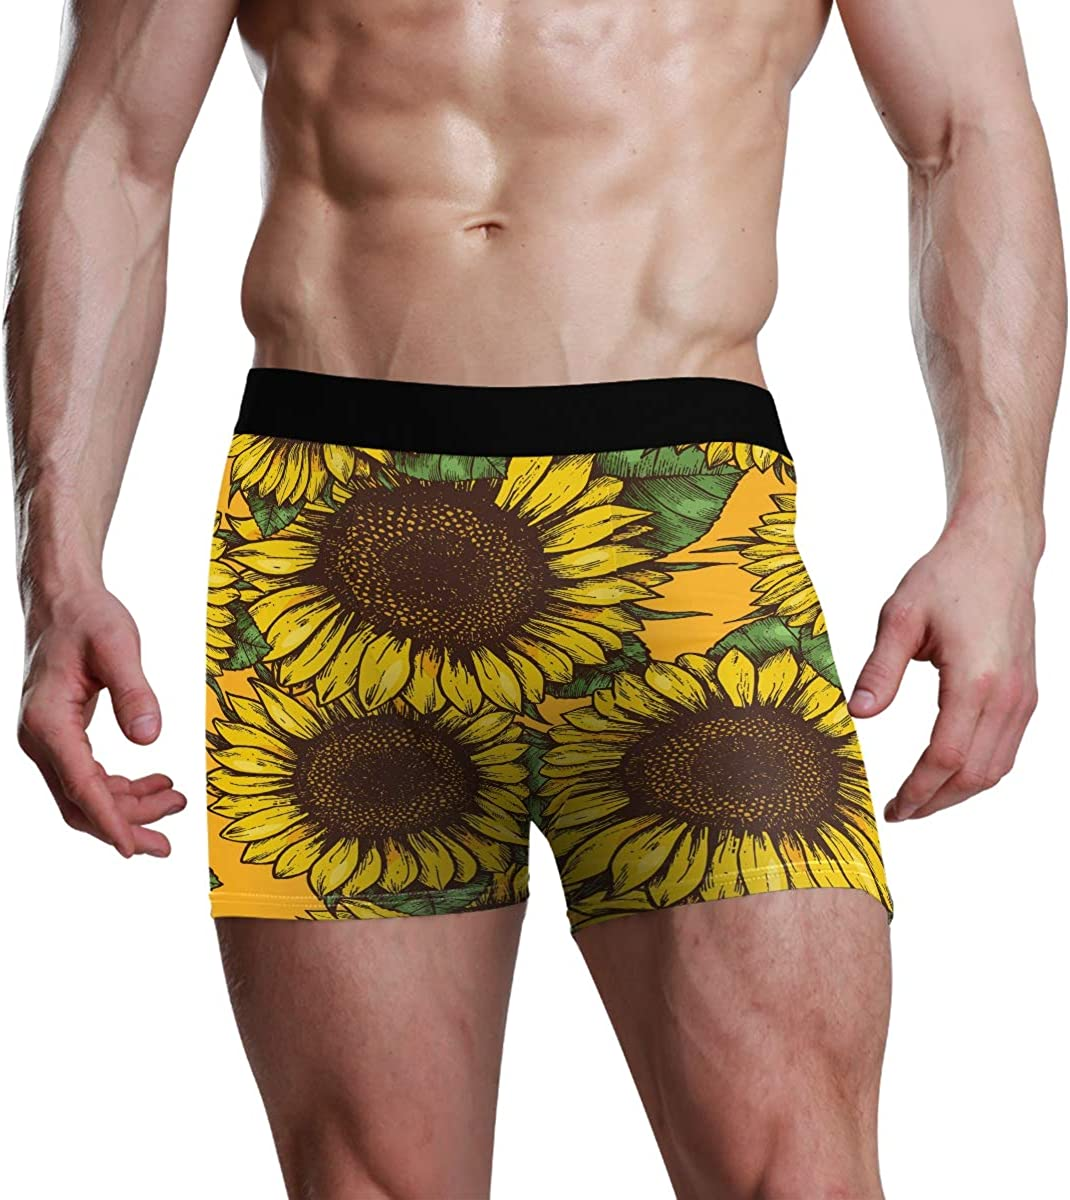 HangWang Men's Underwear Summer Sunflowers Breathable Boxer Briefs Low Rise Long Leg